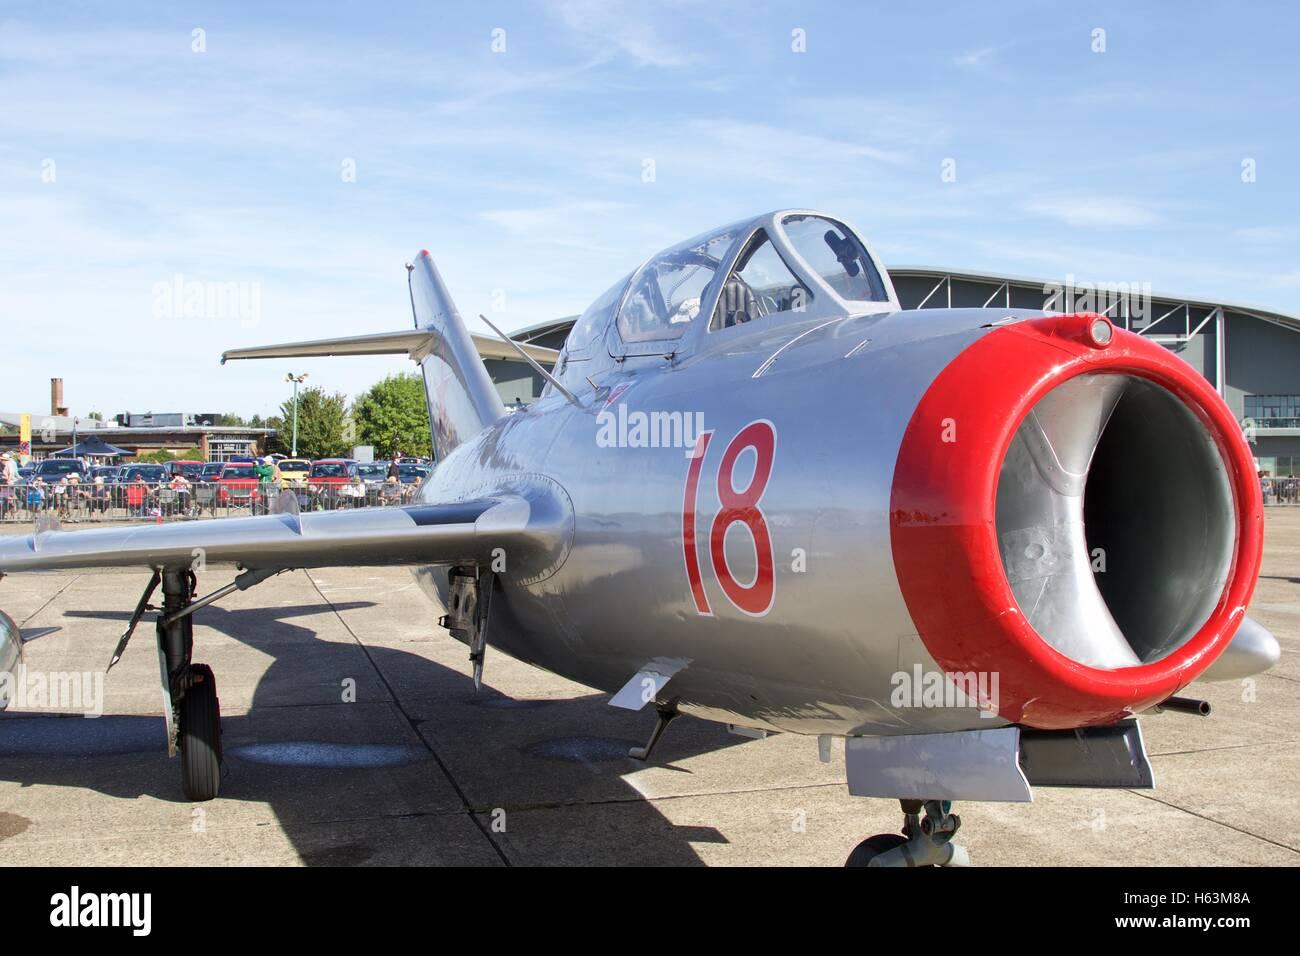 Mikoyan-Gurevich MiG-15 - Stock Image